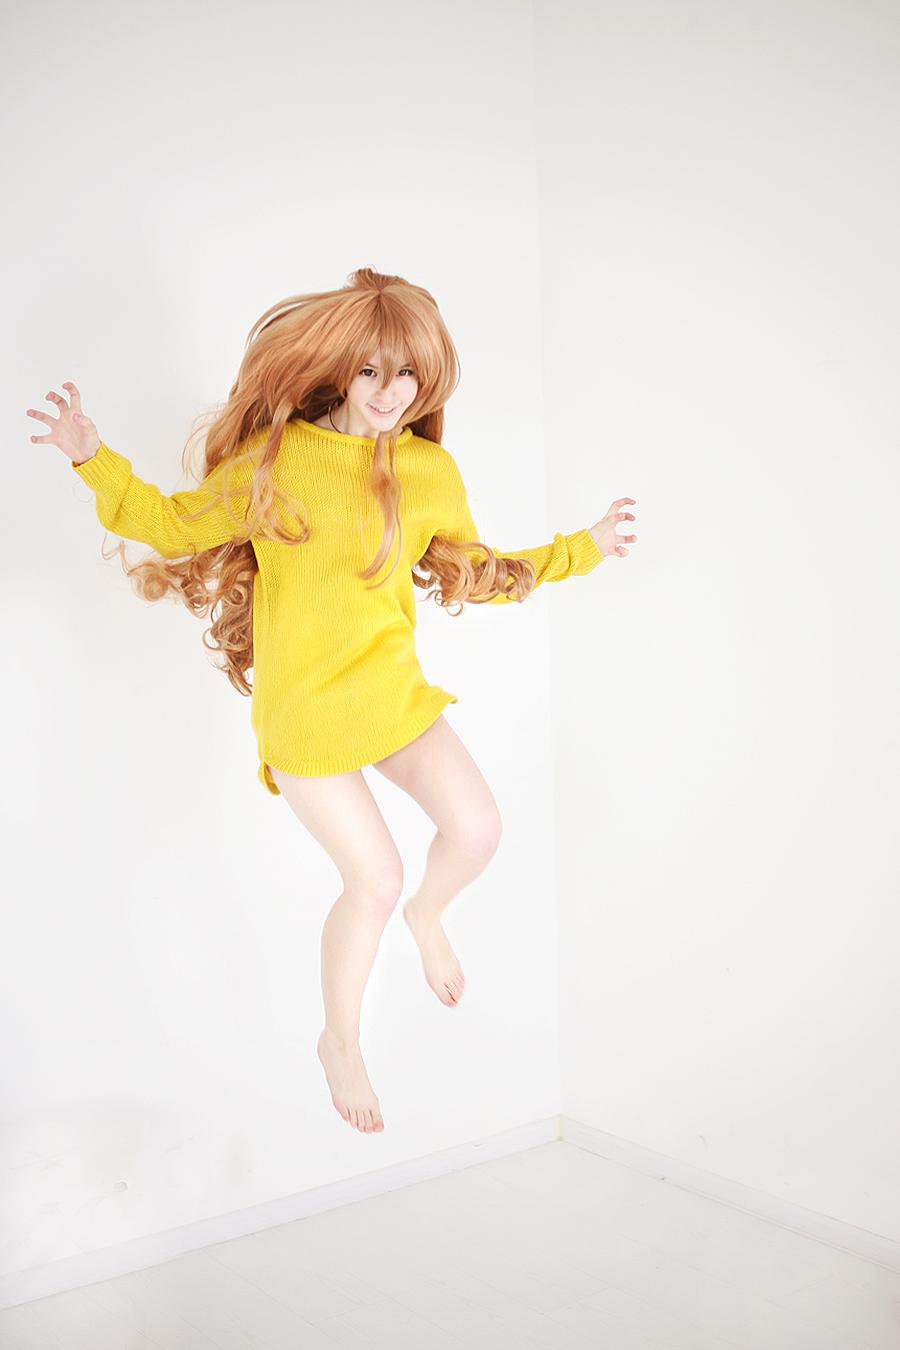 Sweet Astra - Set 9 - Model Blog